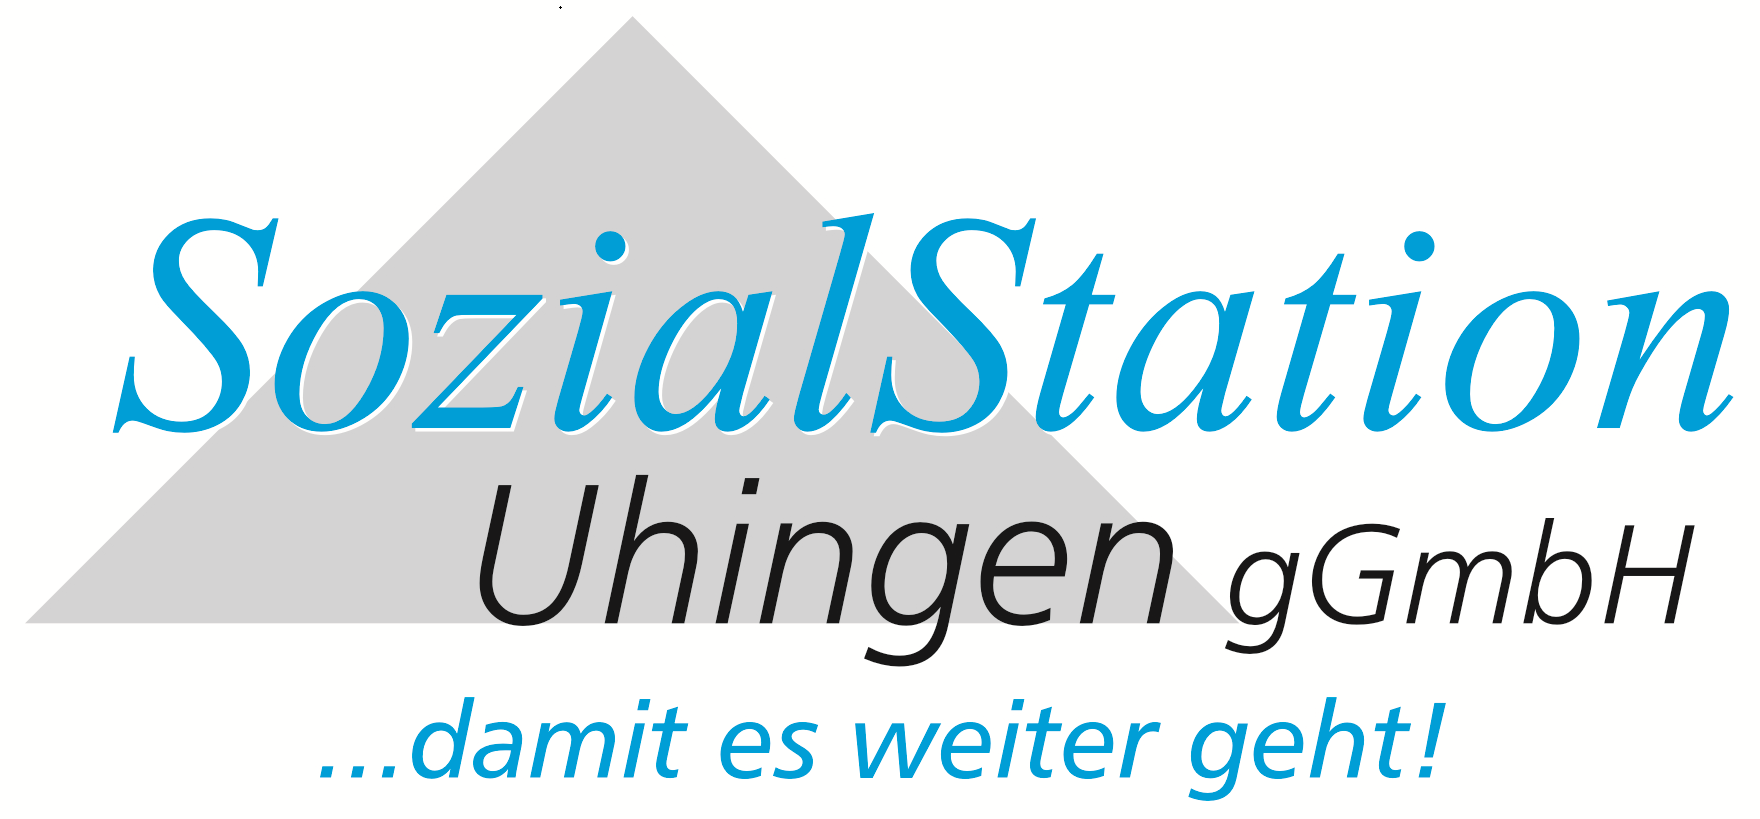 Logo: Sozialstation Uhingen gGmbH